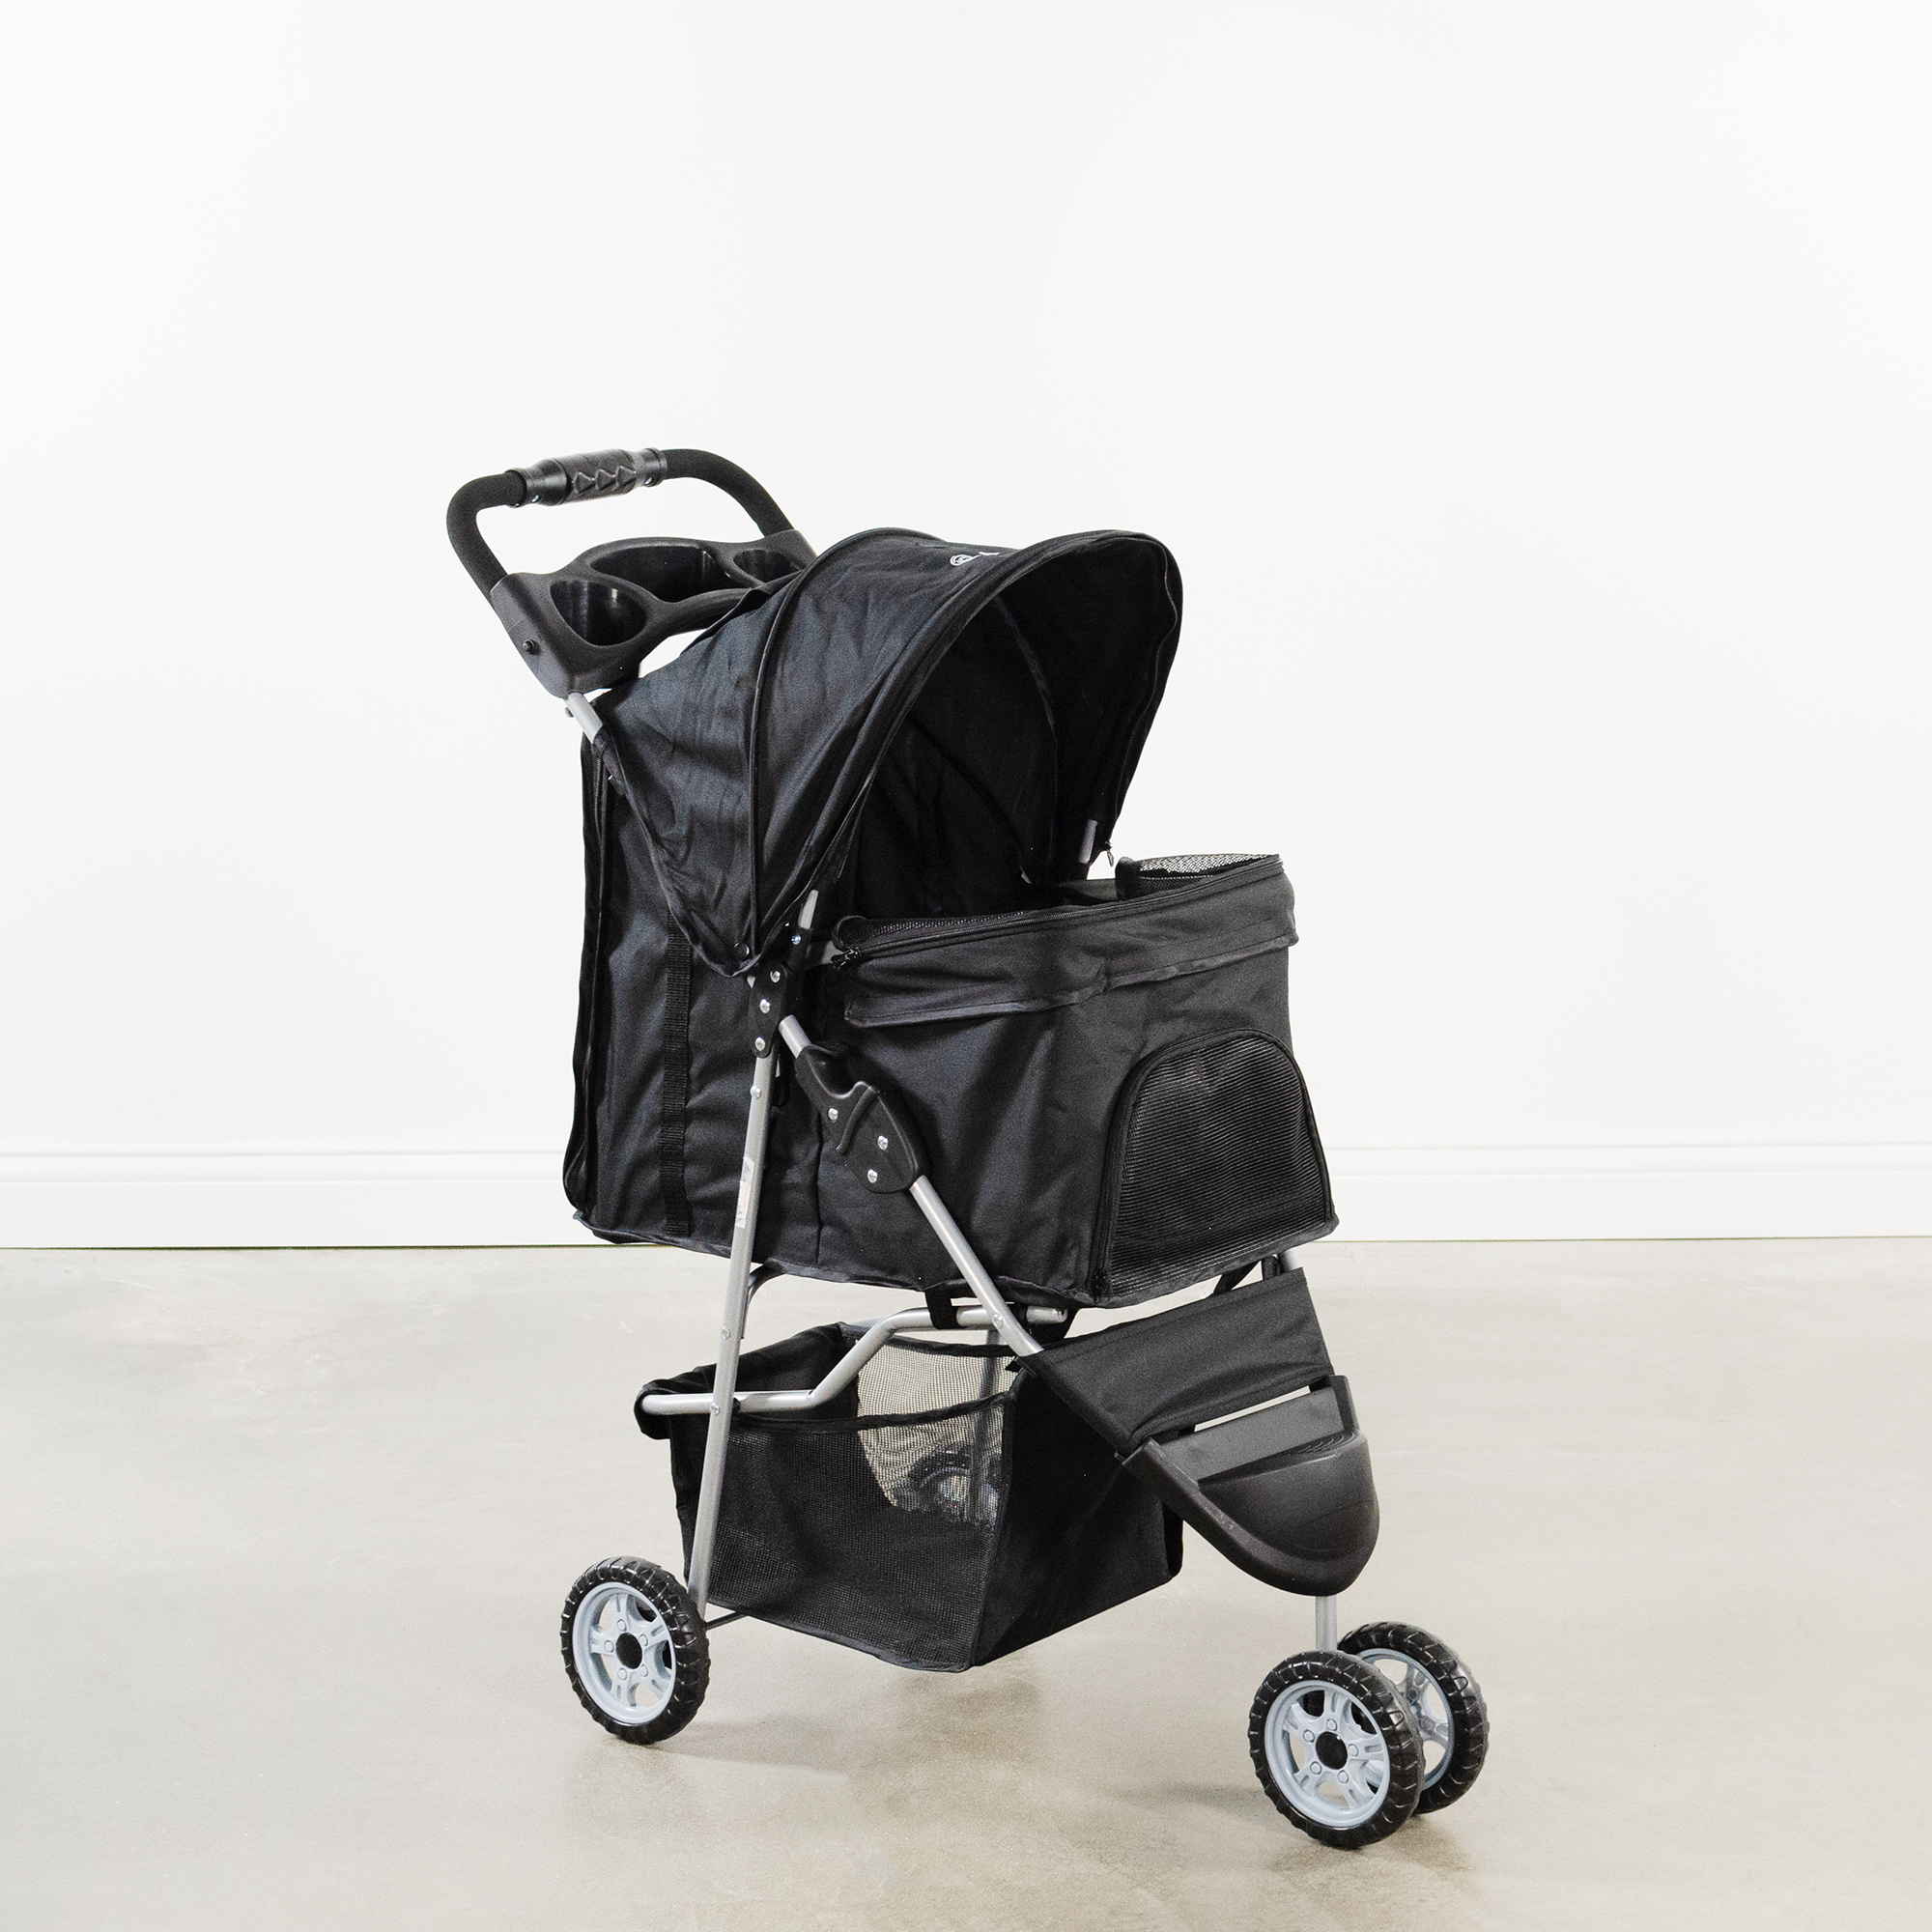 thumbnail 12 - VIVO Three Wheel Pet Stroller / Cat & Dog Foldable Carrier Strolling Cart